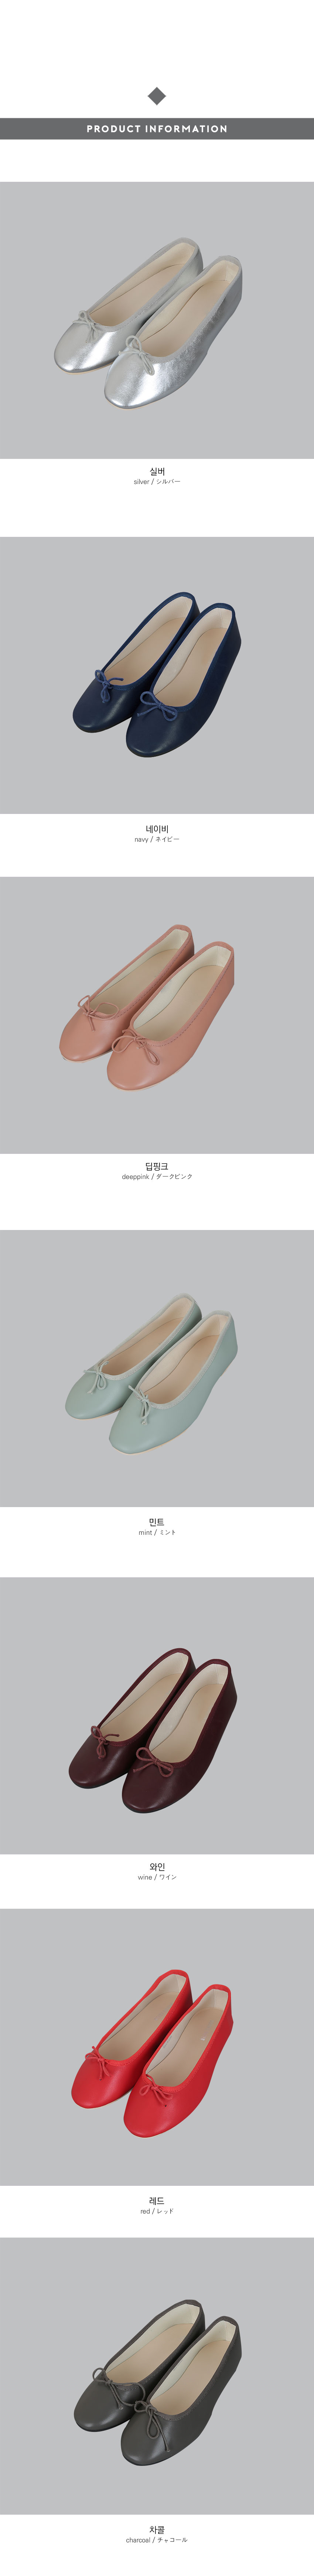 Girl flat shoes